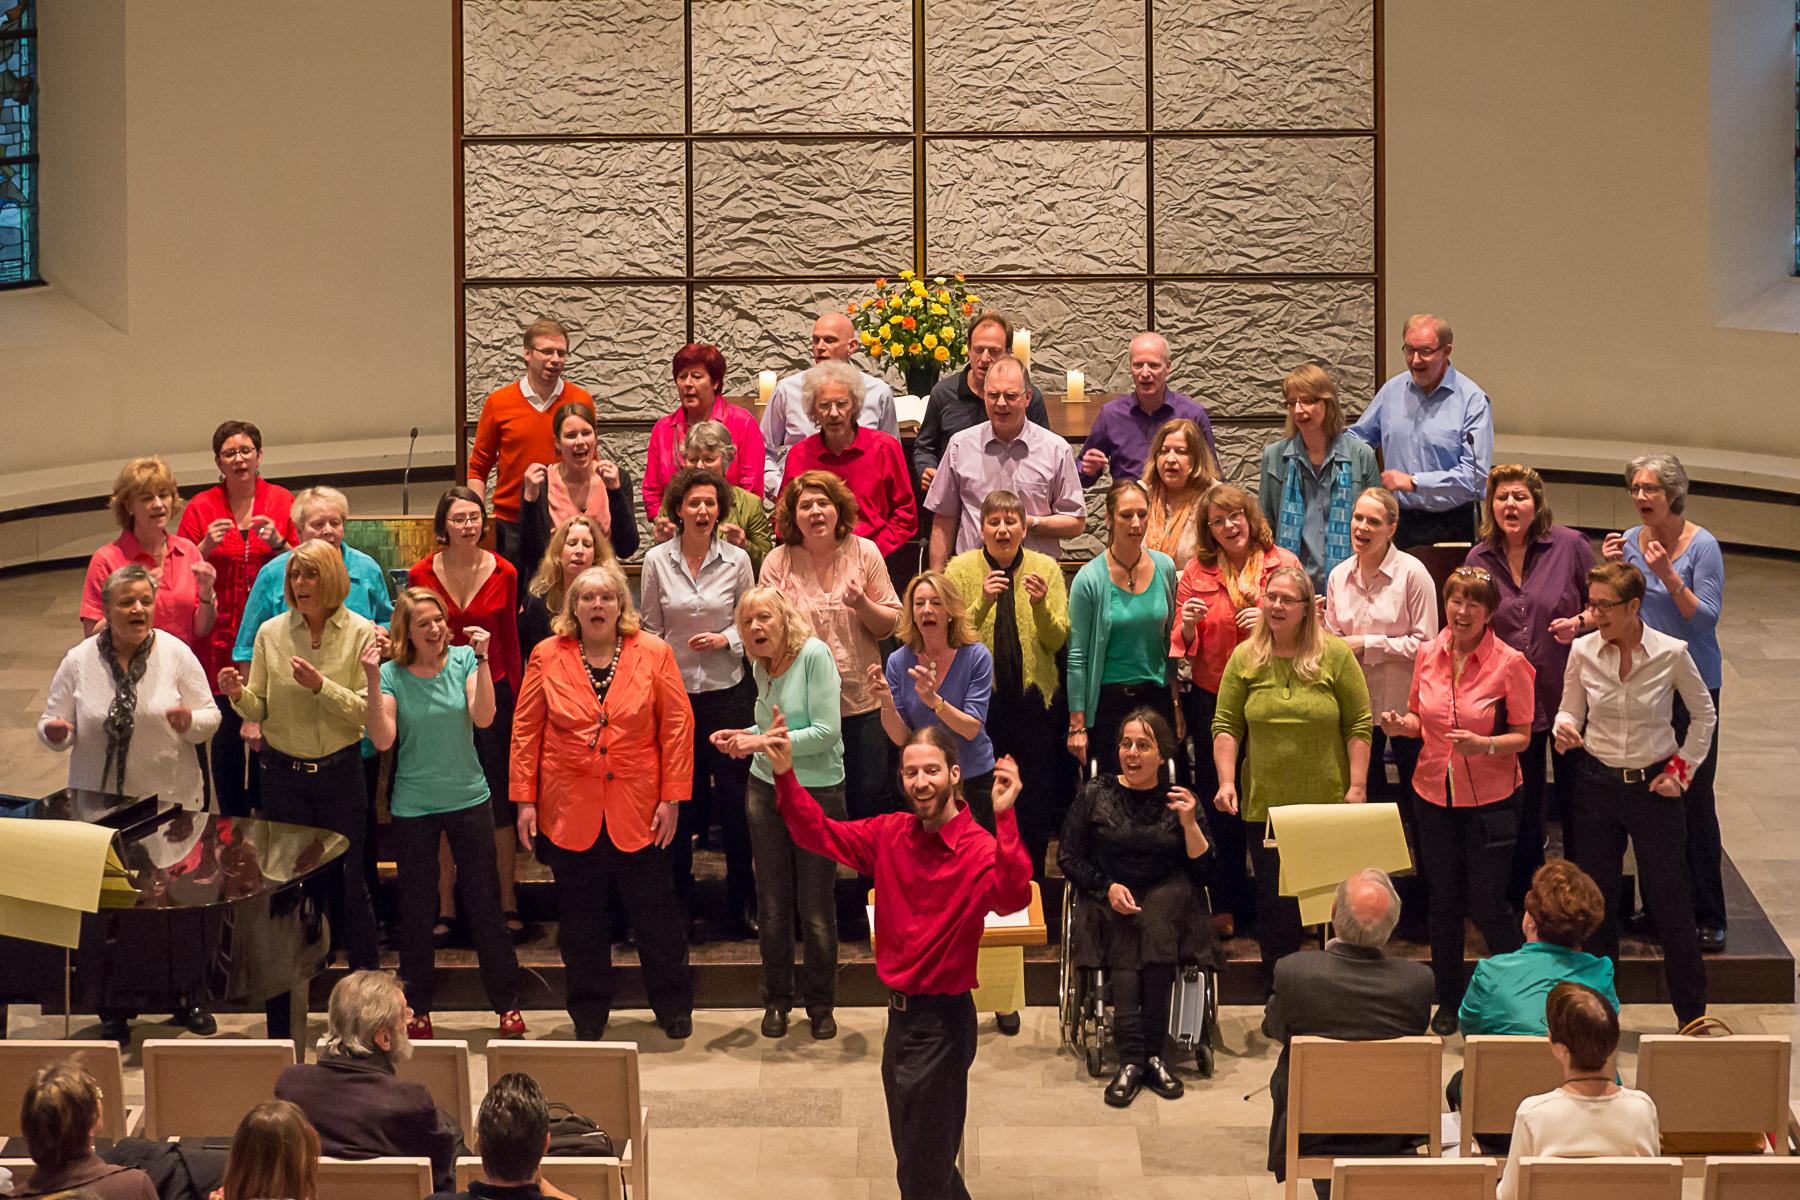 St. Jacob's Gospel Singers